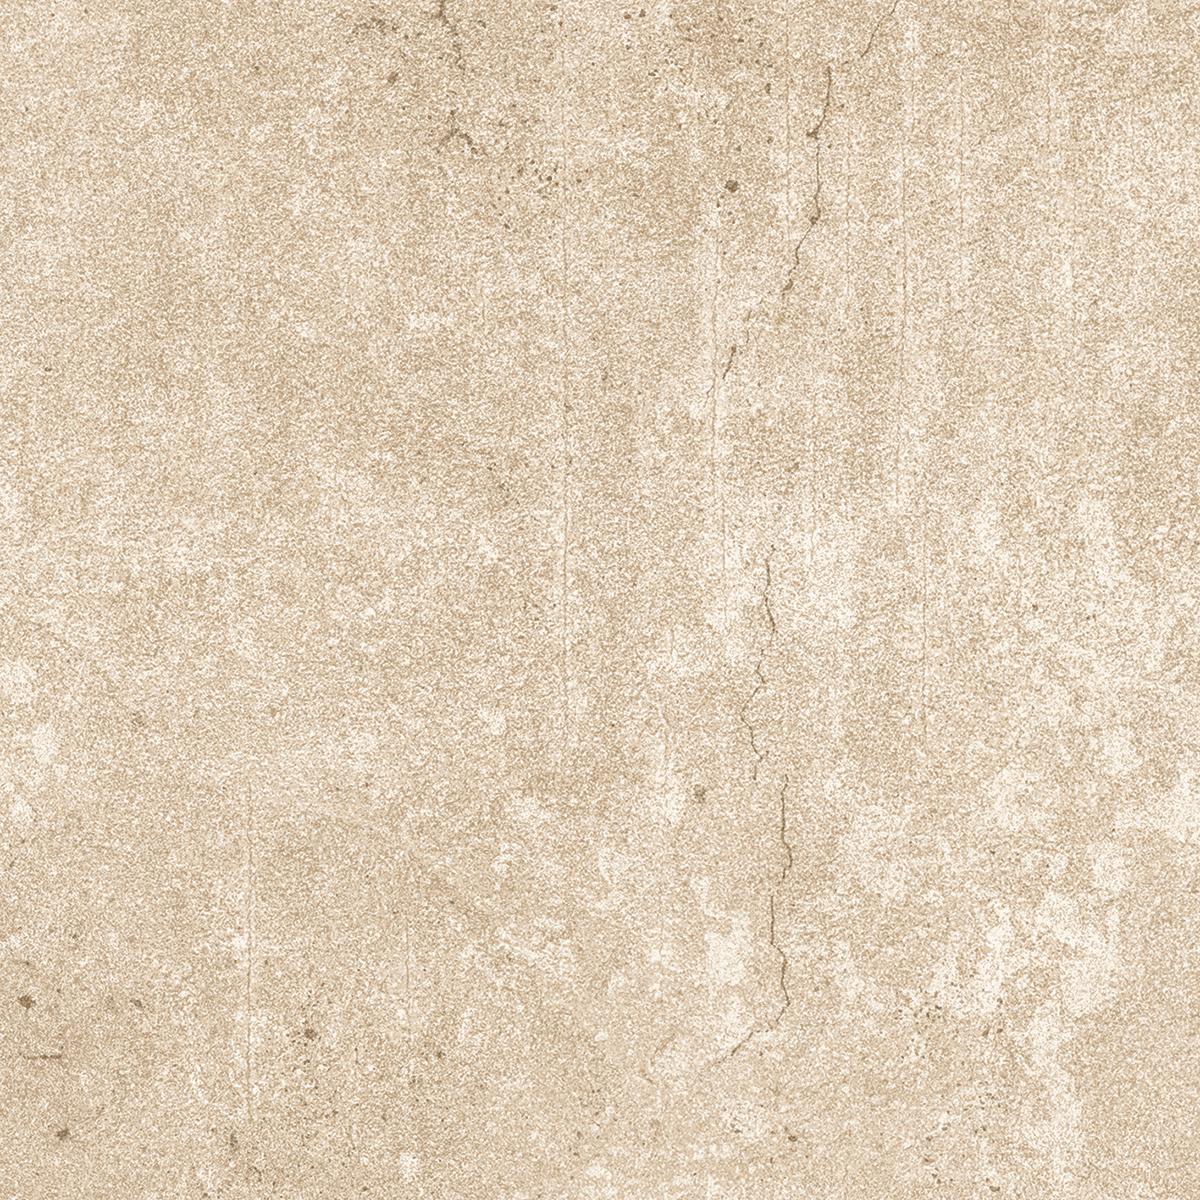 BROOKLYN sandstein Image